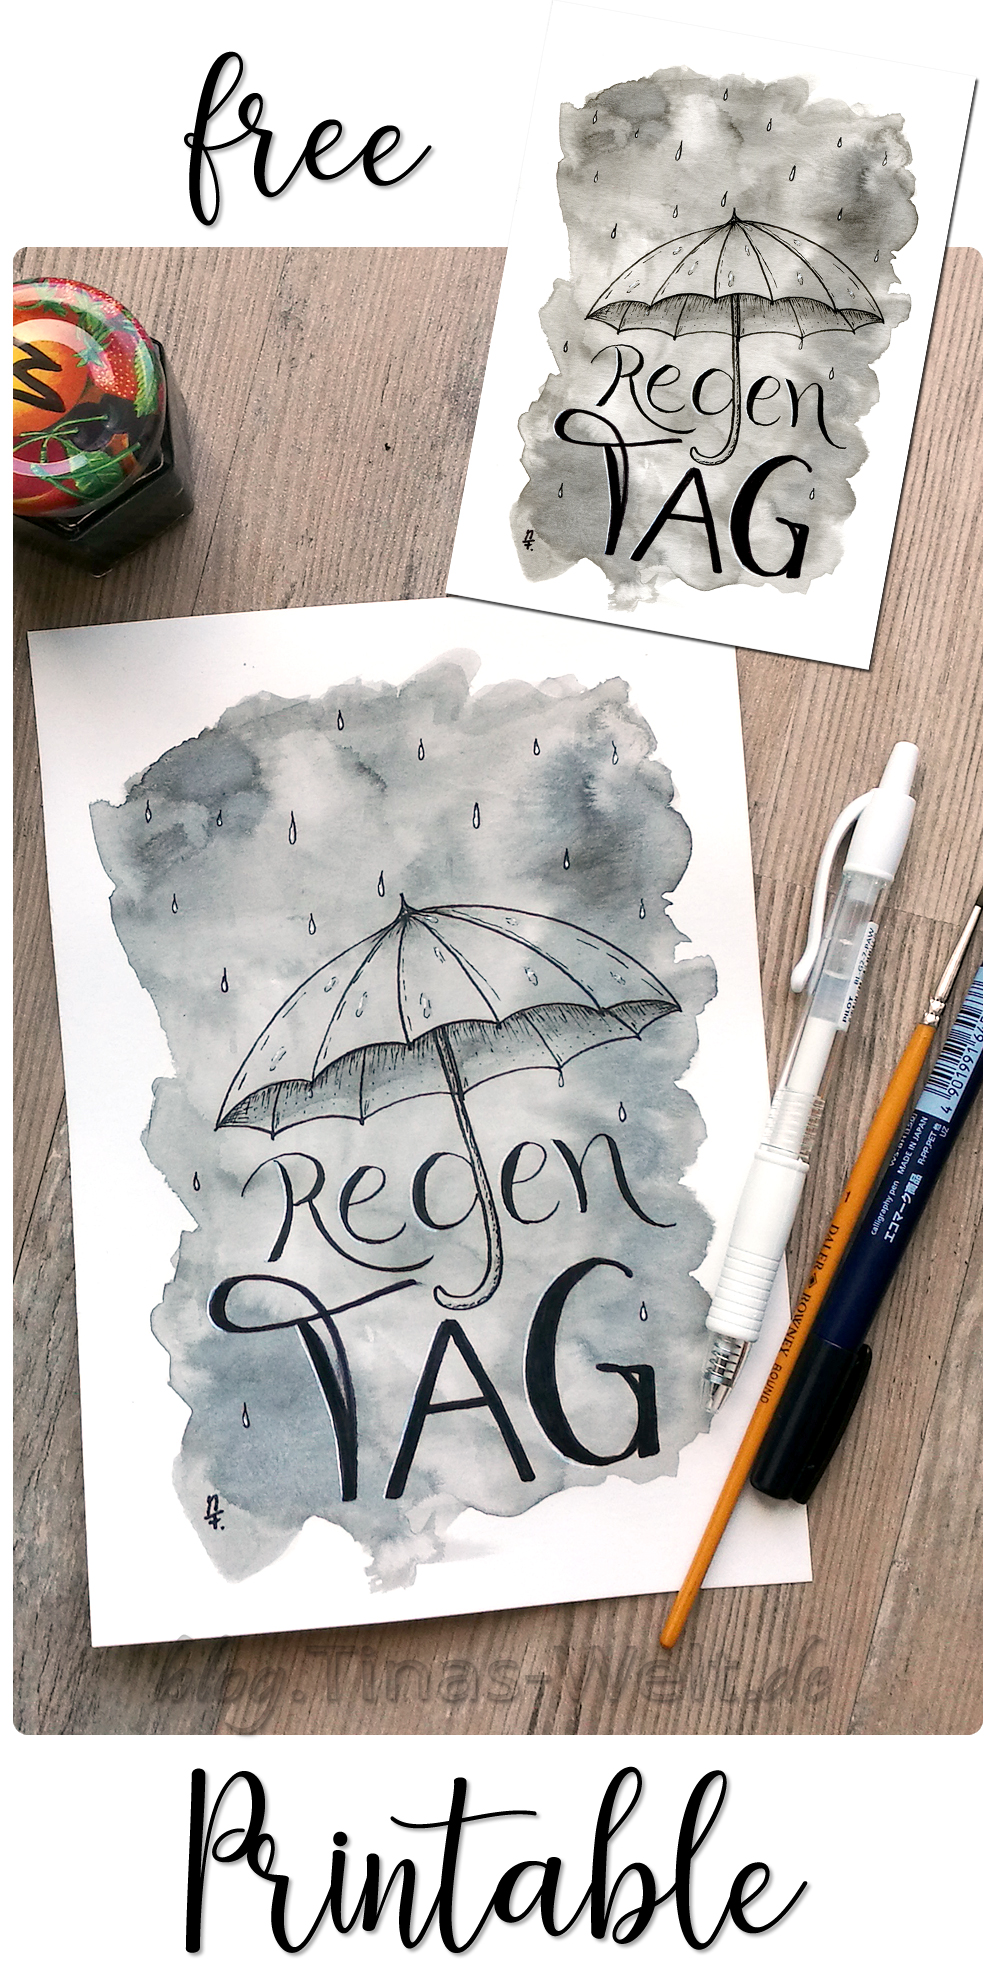 Inktober 2017 - Tag 31 - Regentag Handlettering